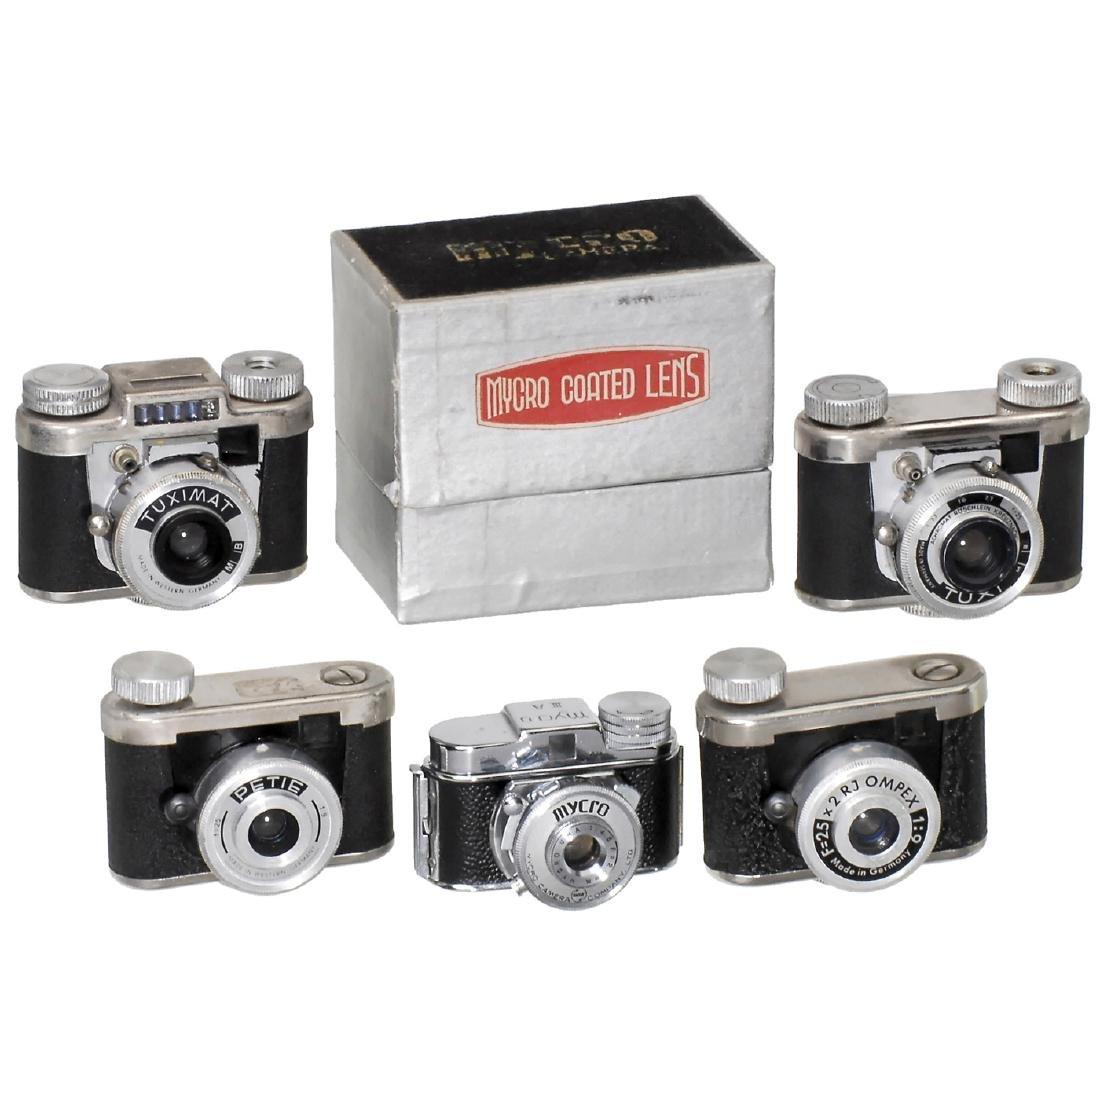 5 Cameras for 16 mm